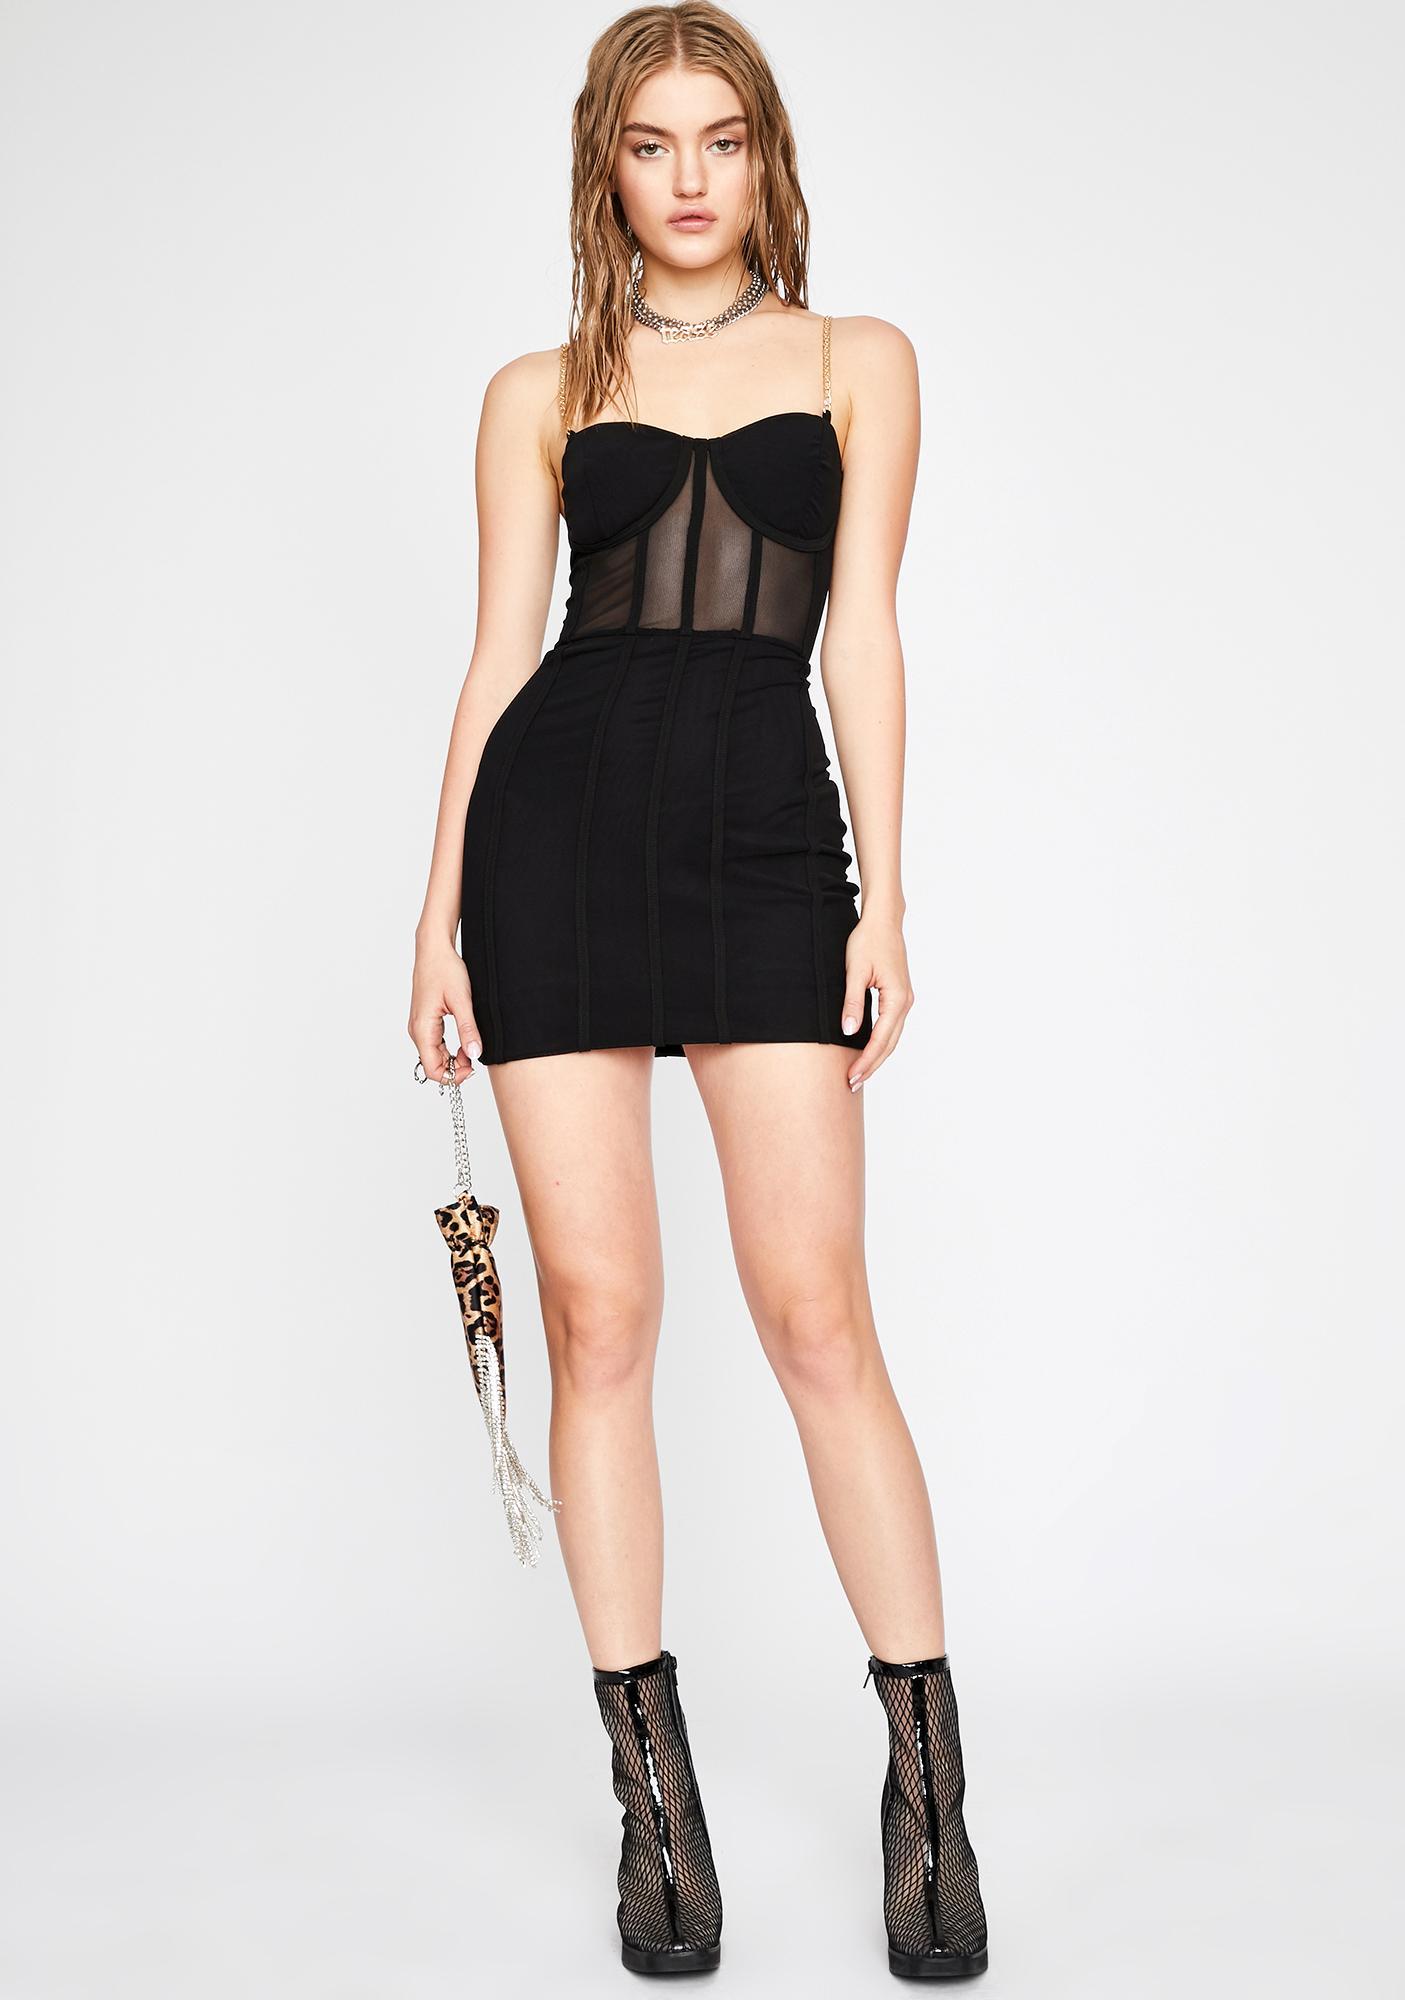 Dark Professionally Dangerous Mini Dress